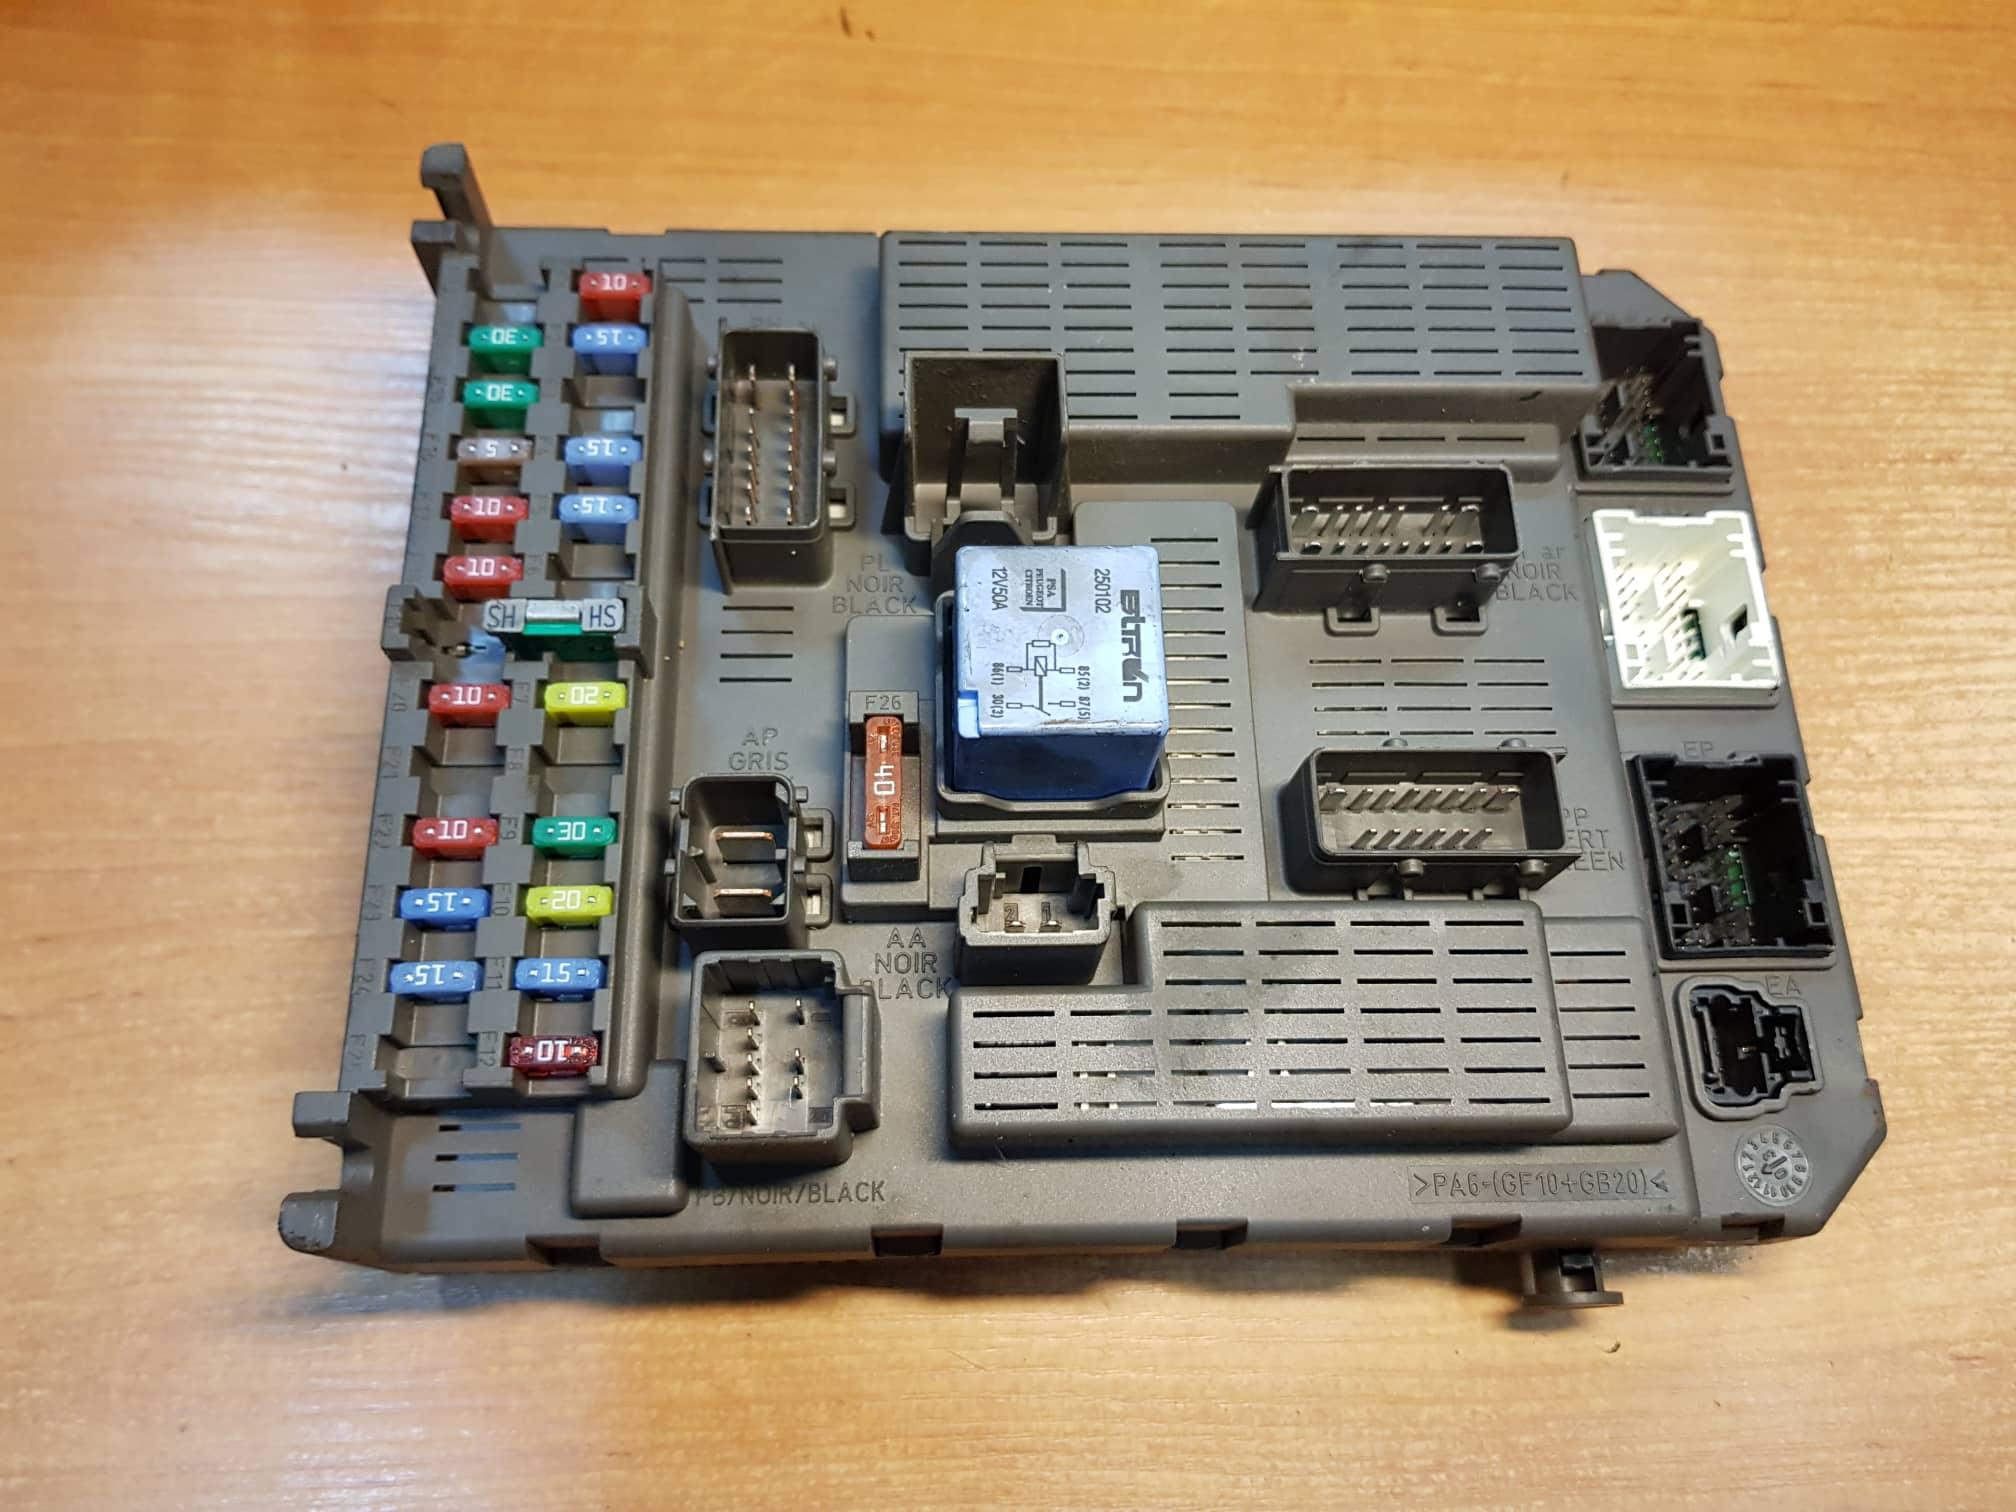 Citroen C8 Peugeot 807 Fiat Ulysse 2 0 HDI BSI FUSE BOX